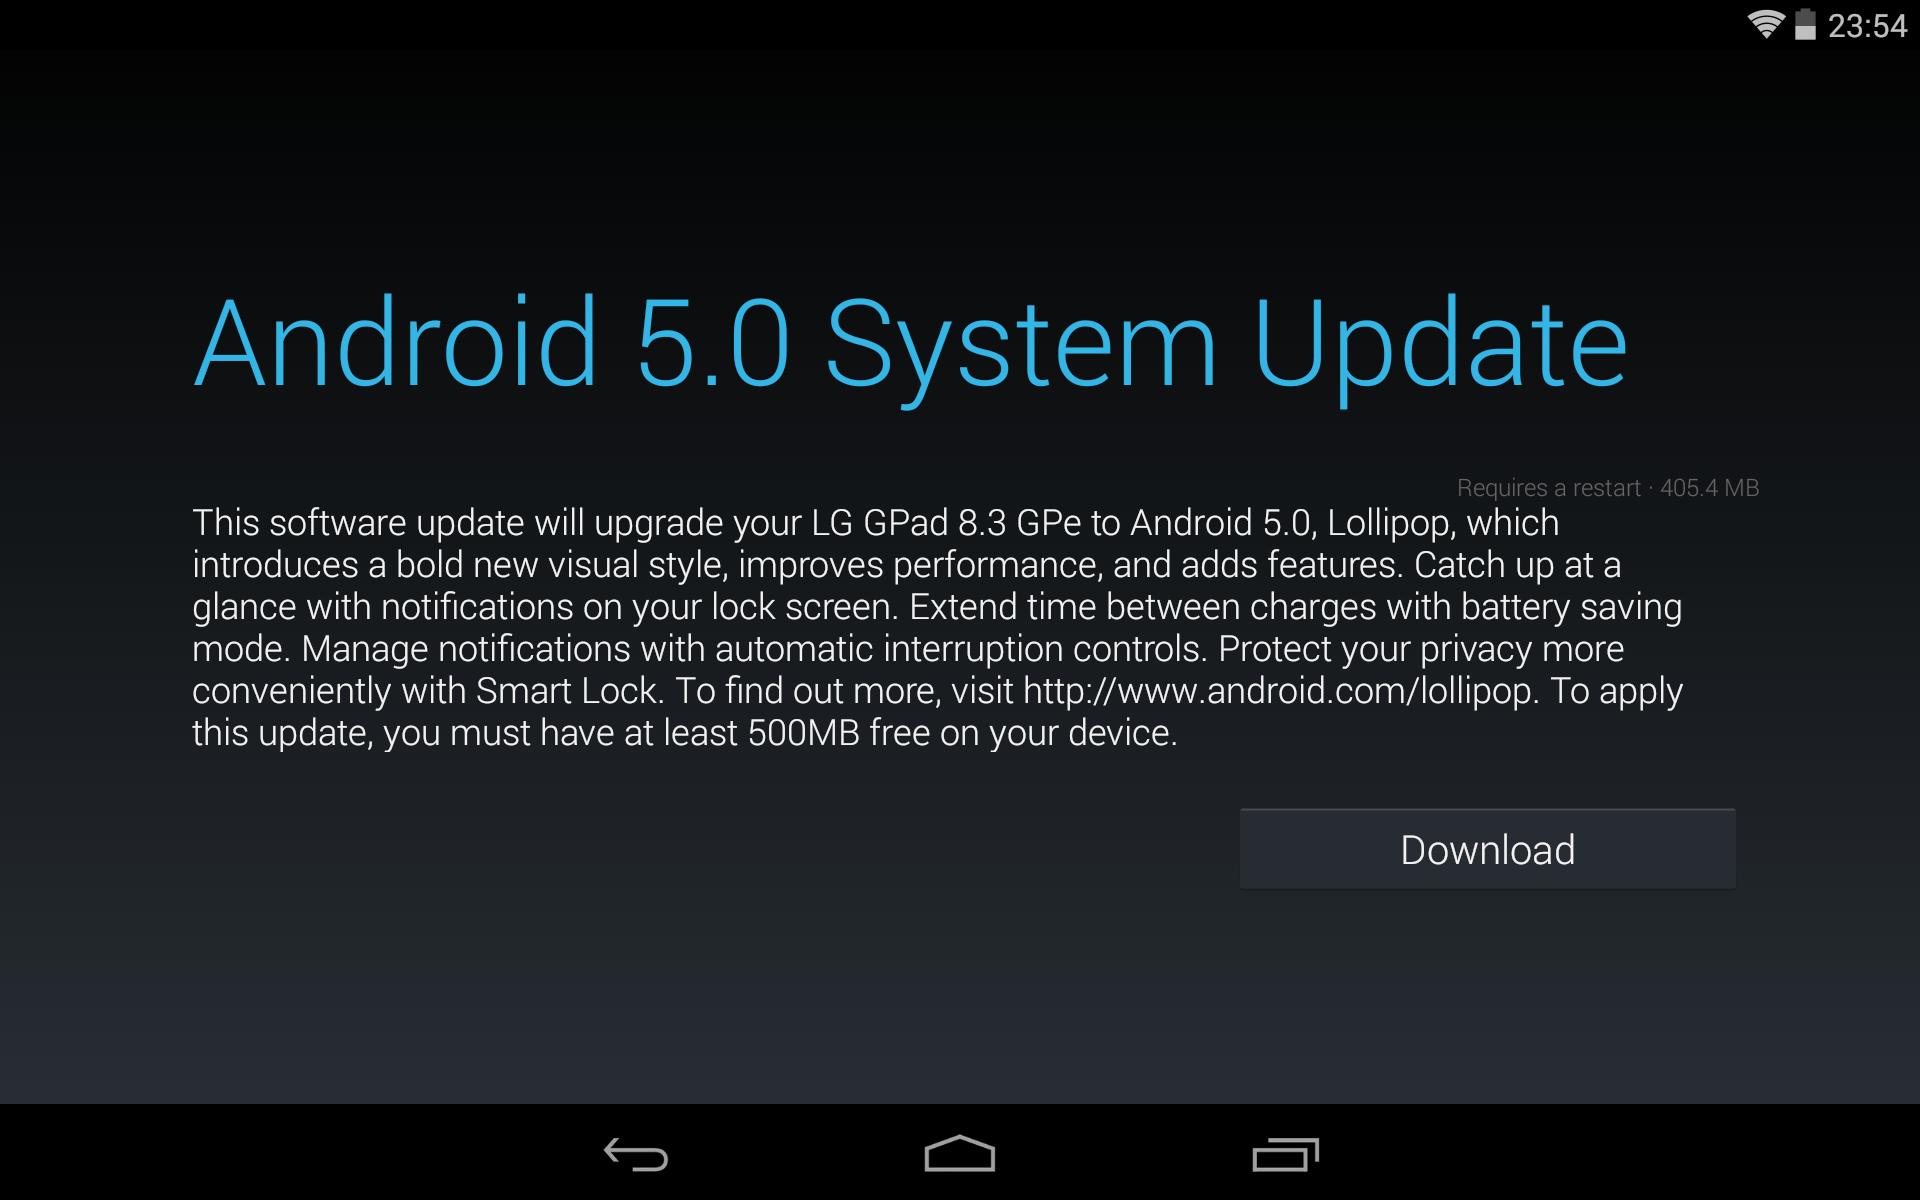 Android 5.0 Lollipop arriva su LG G Pad 8.3 GPe e Sony Xperia Z2!